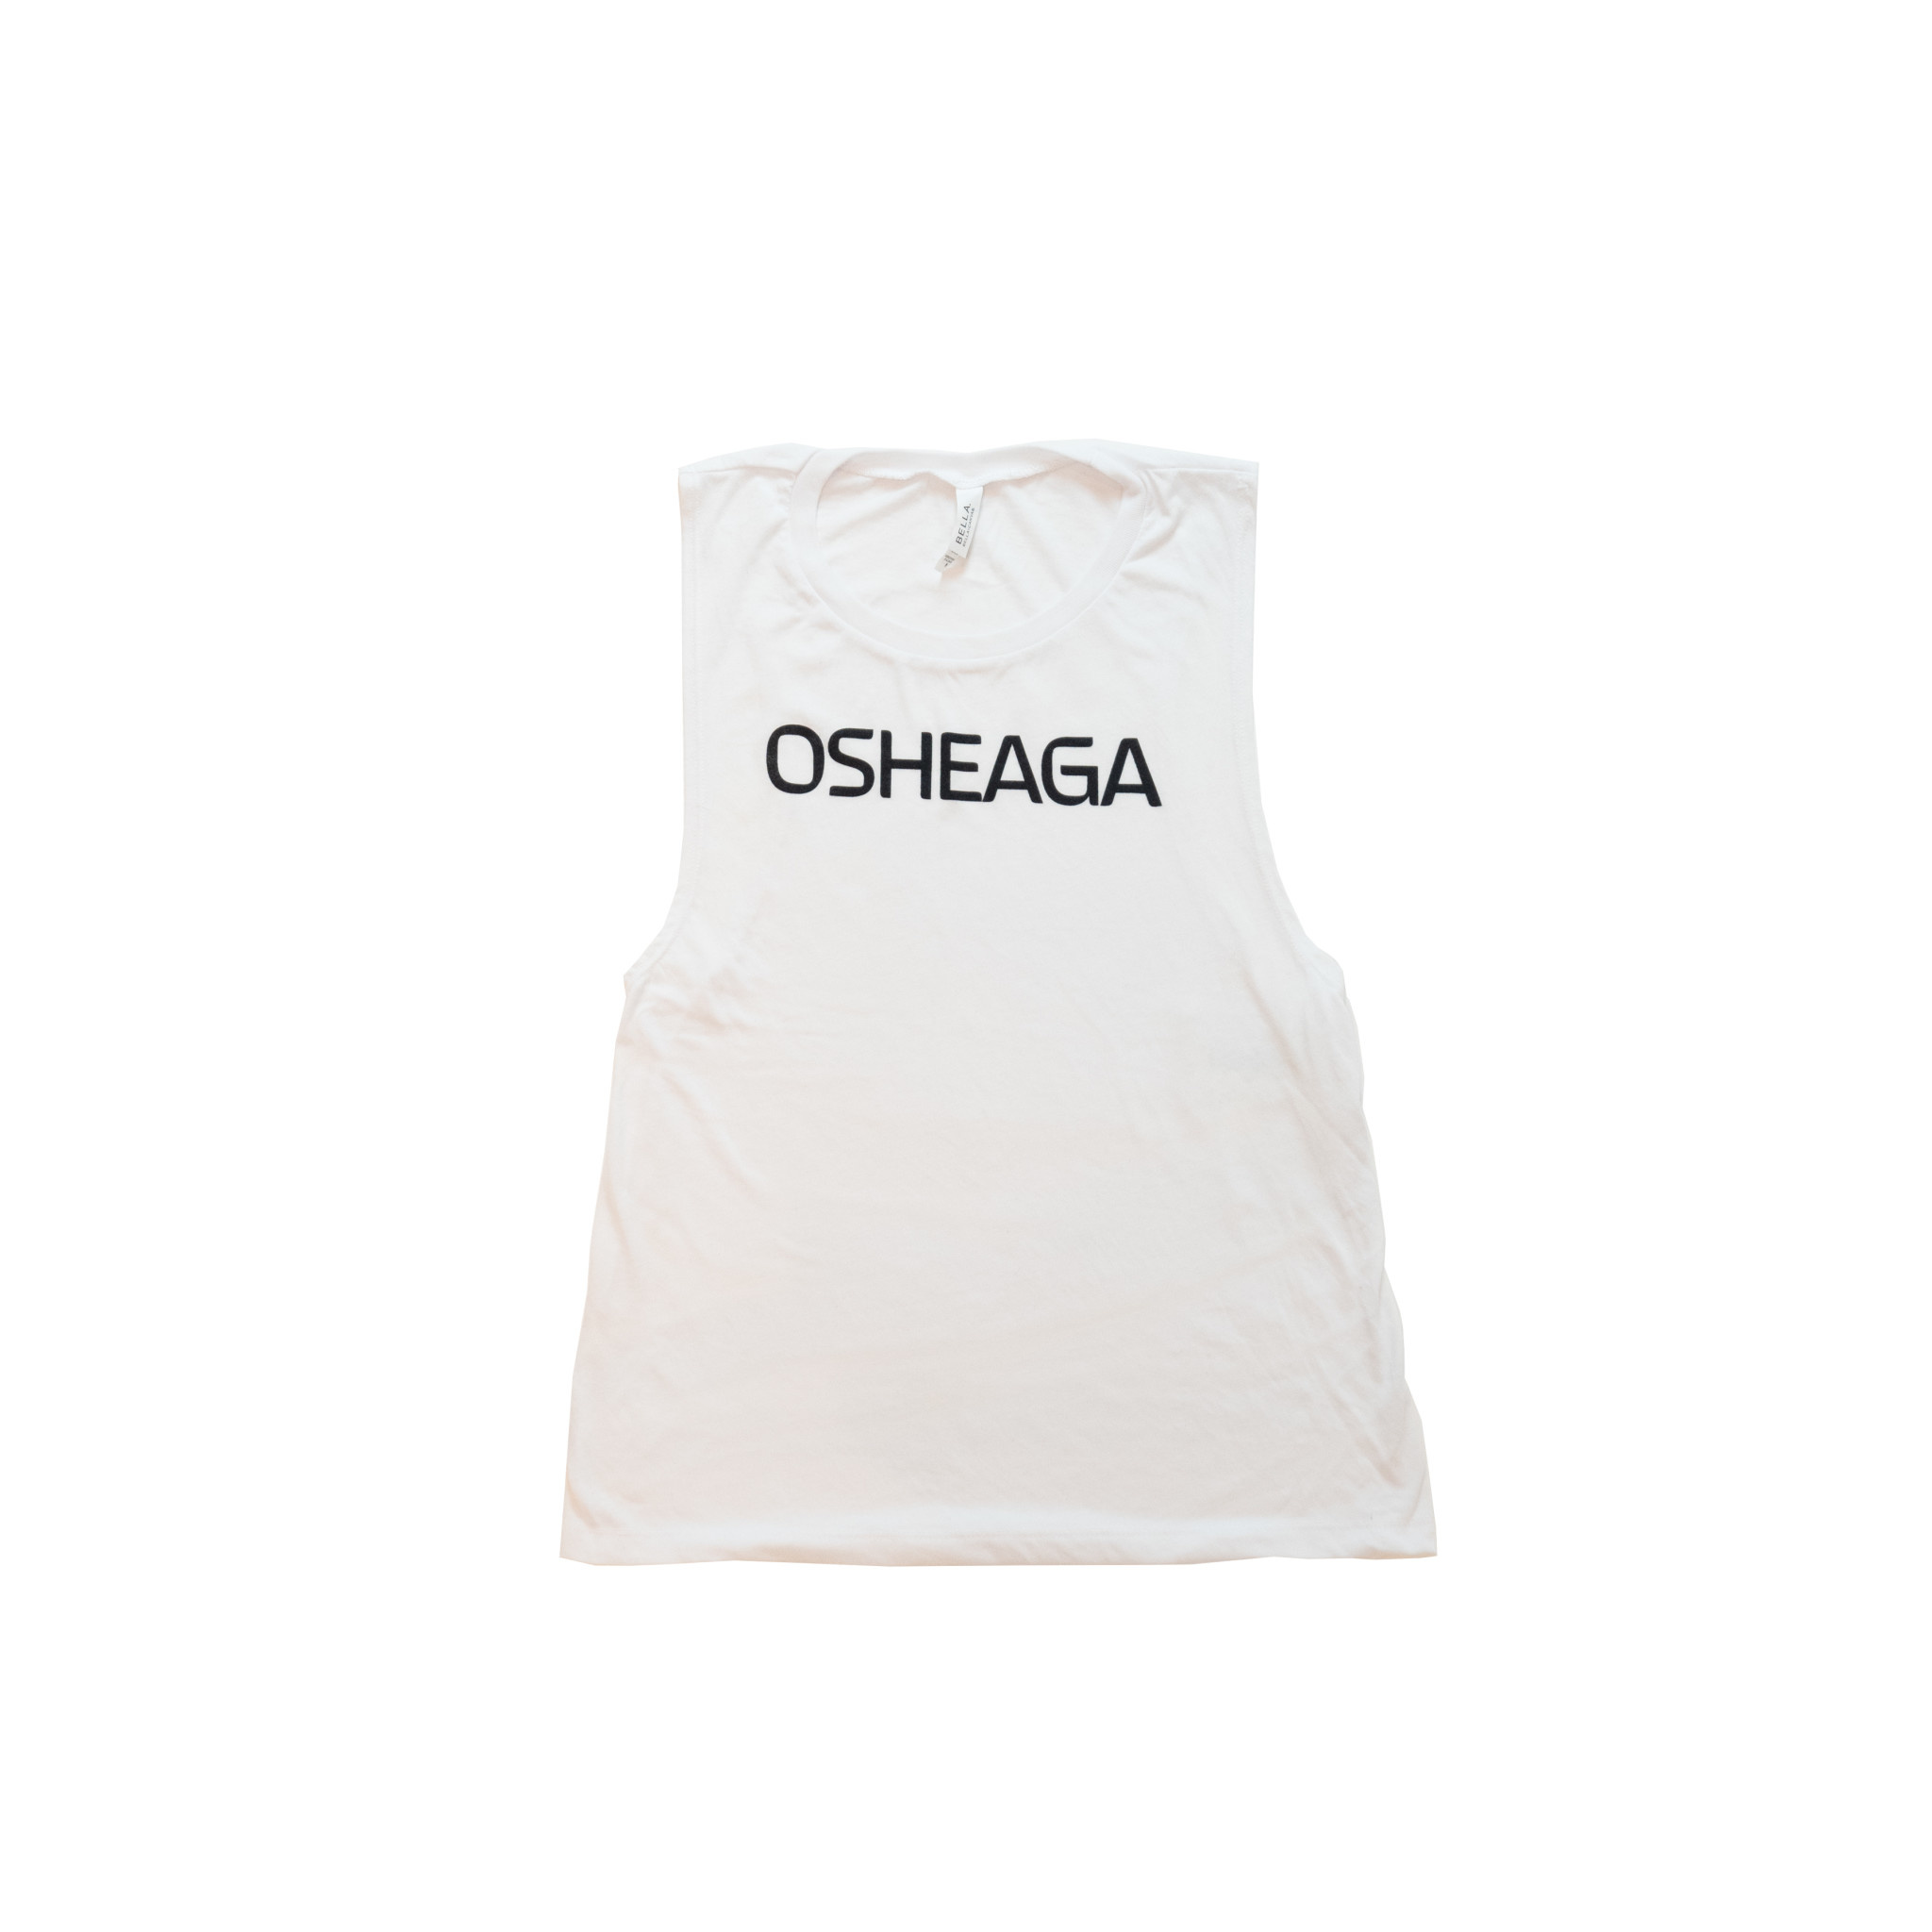 Osheaga Arts & Music Women's Tank